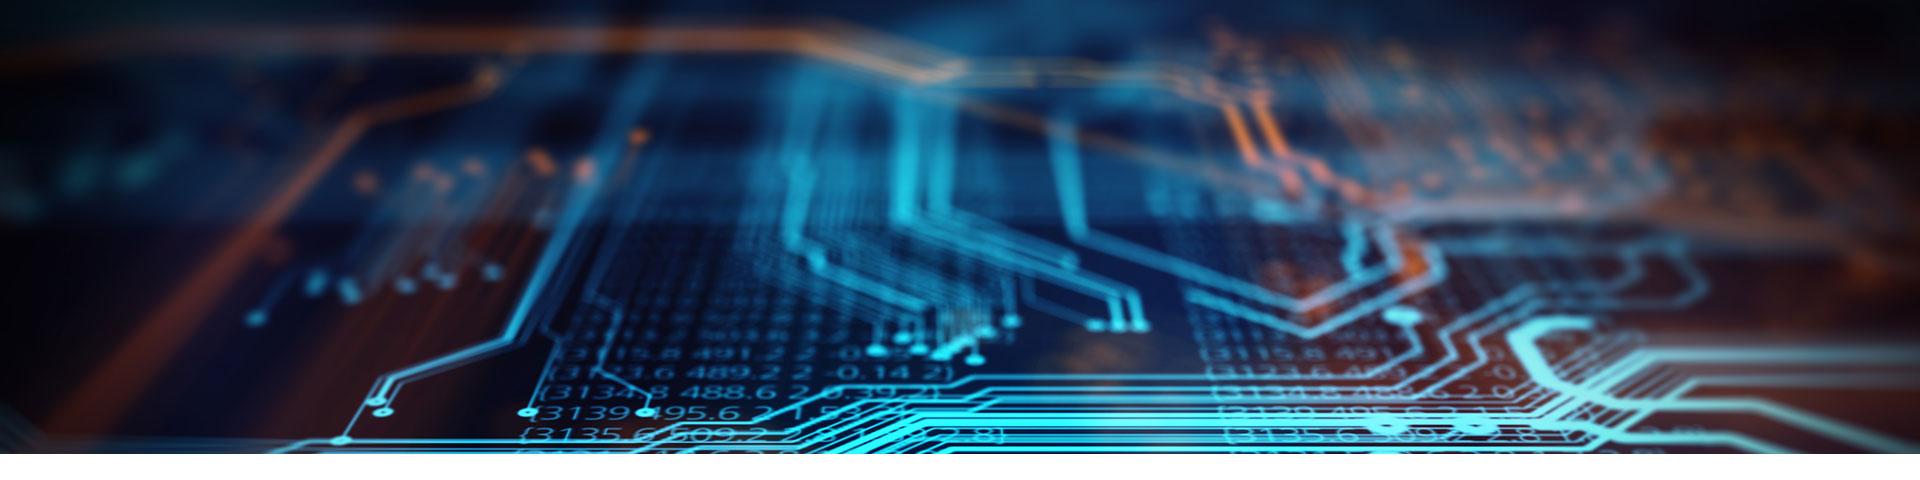 promwad FPGA design